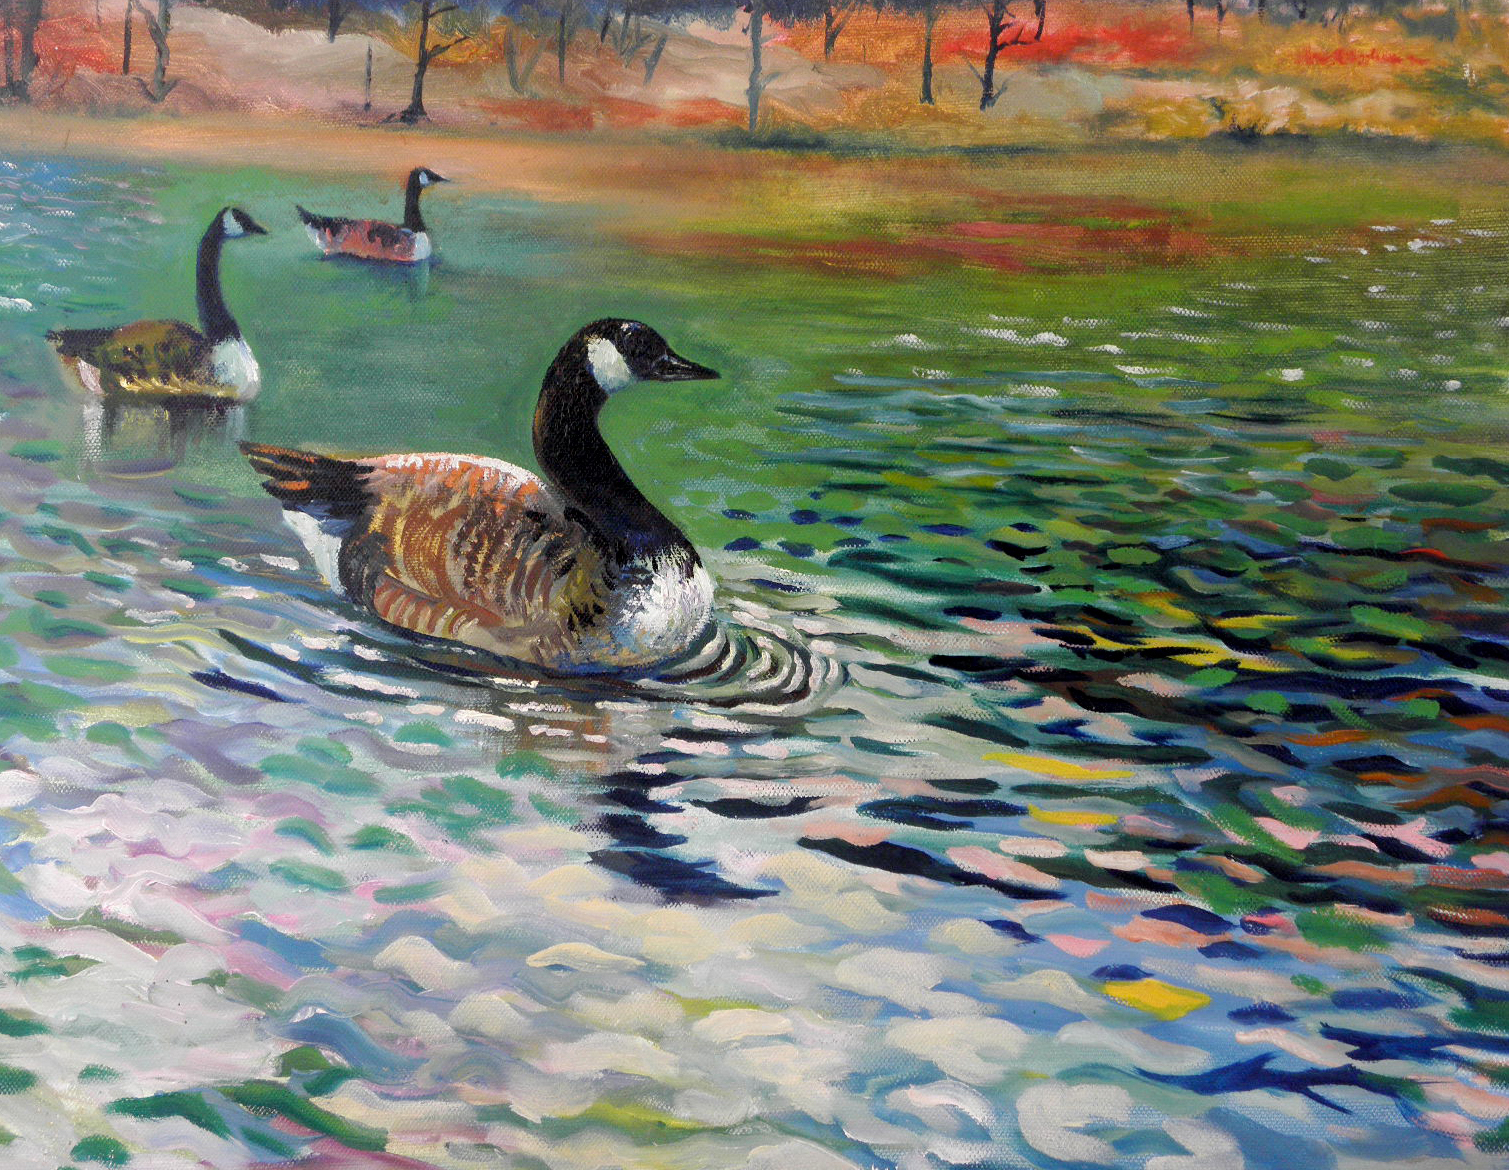 Original art on canvas_painting for sale_wildlife art_bird painting